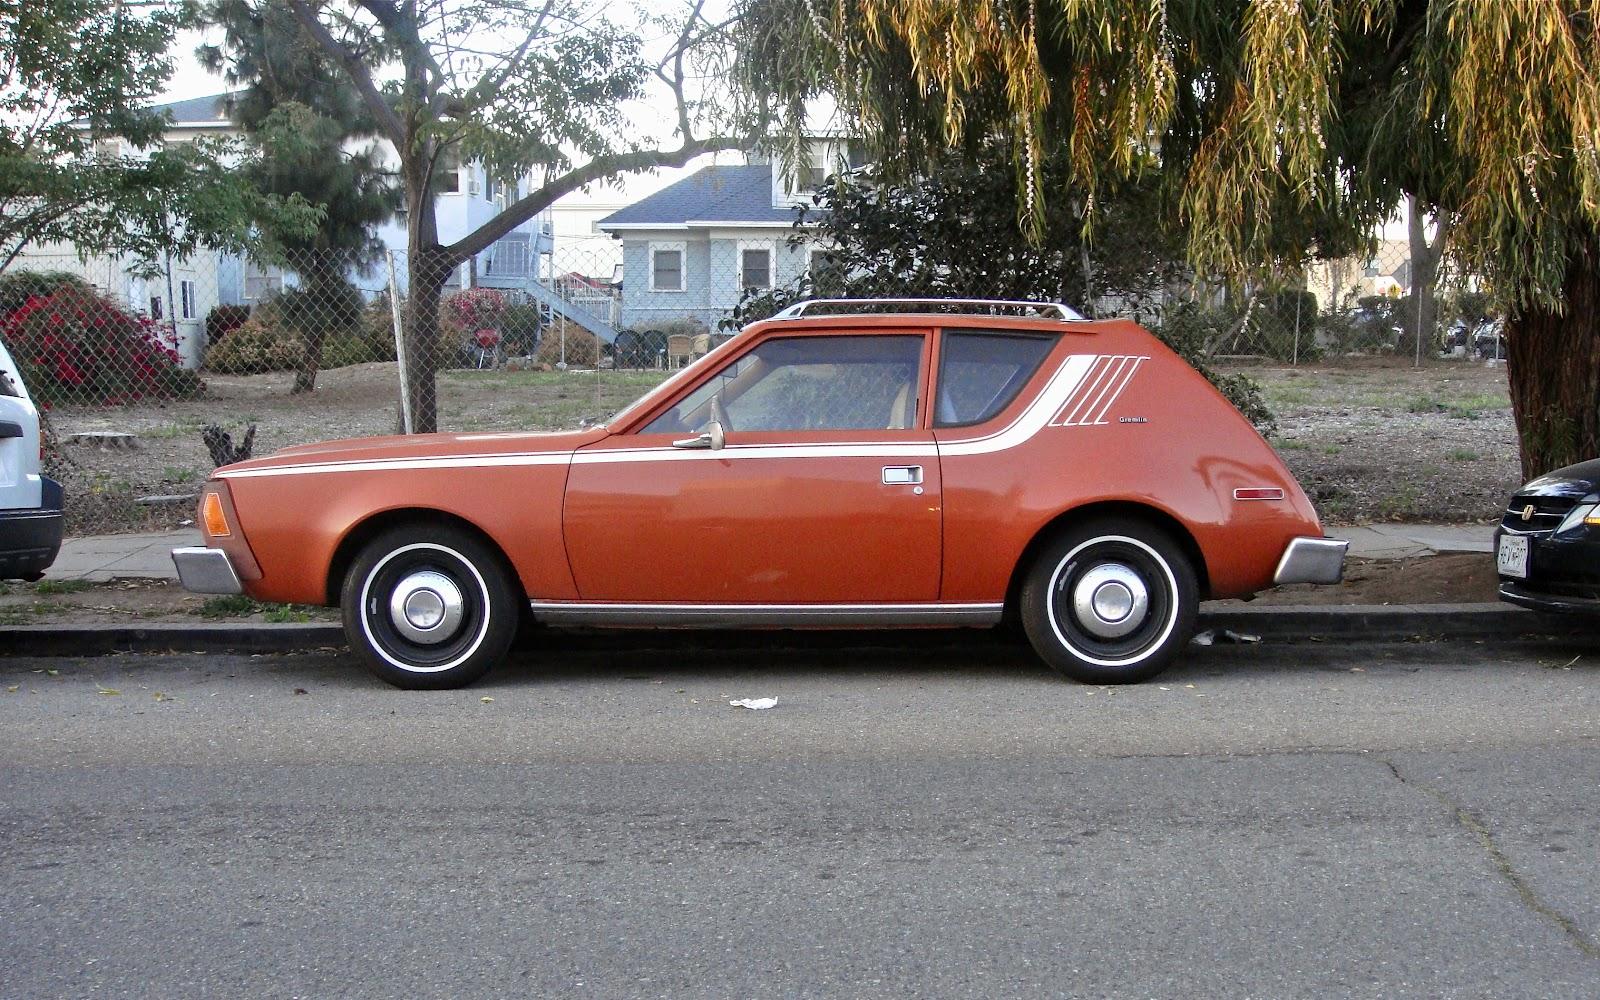 THE STREET PEEP: 1975 AMC Gremlin